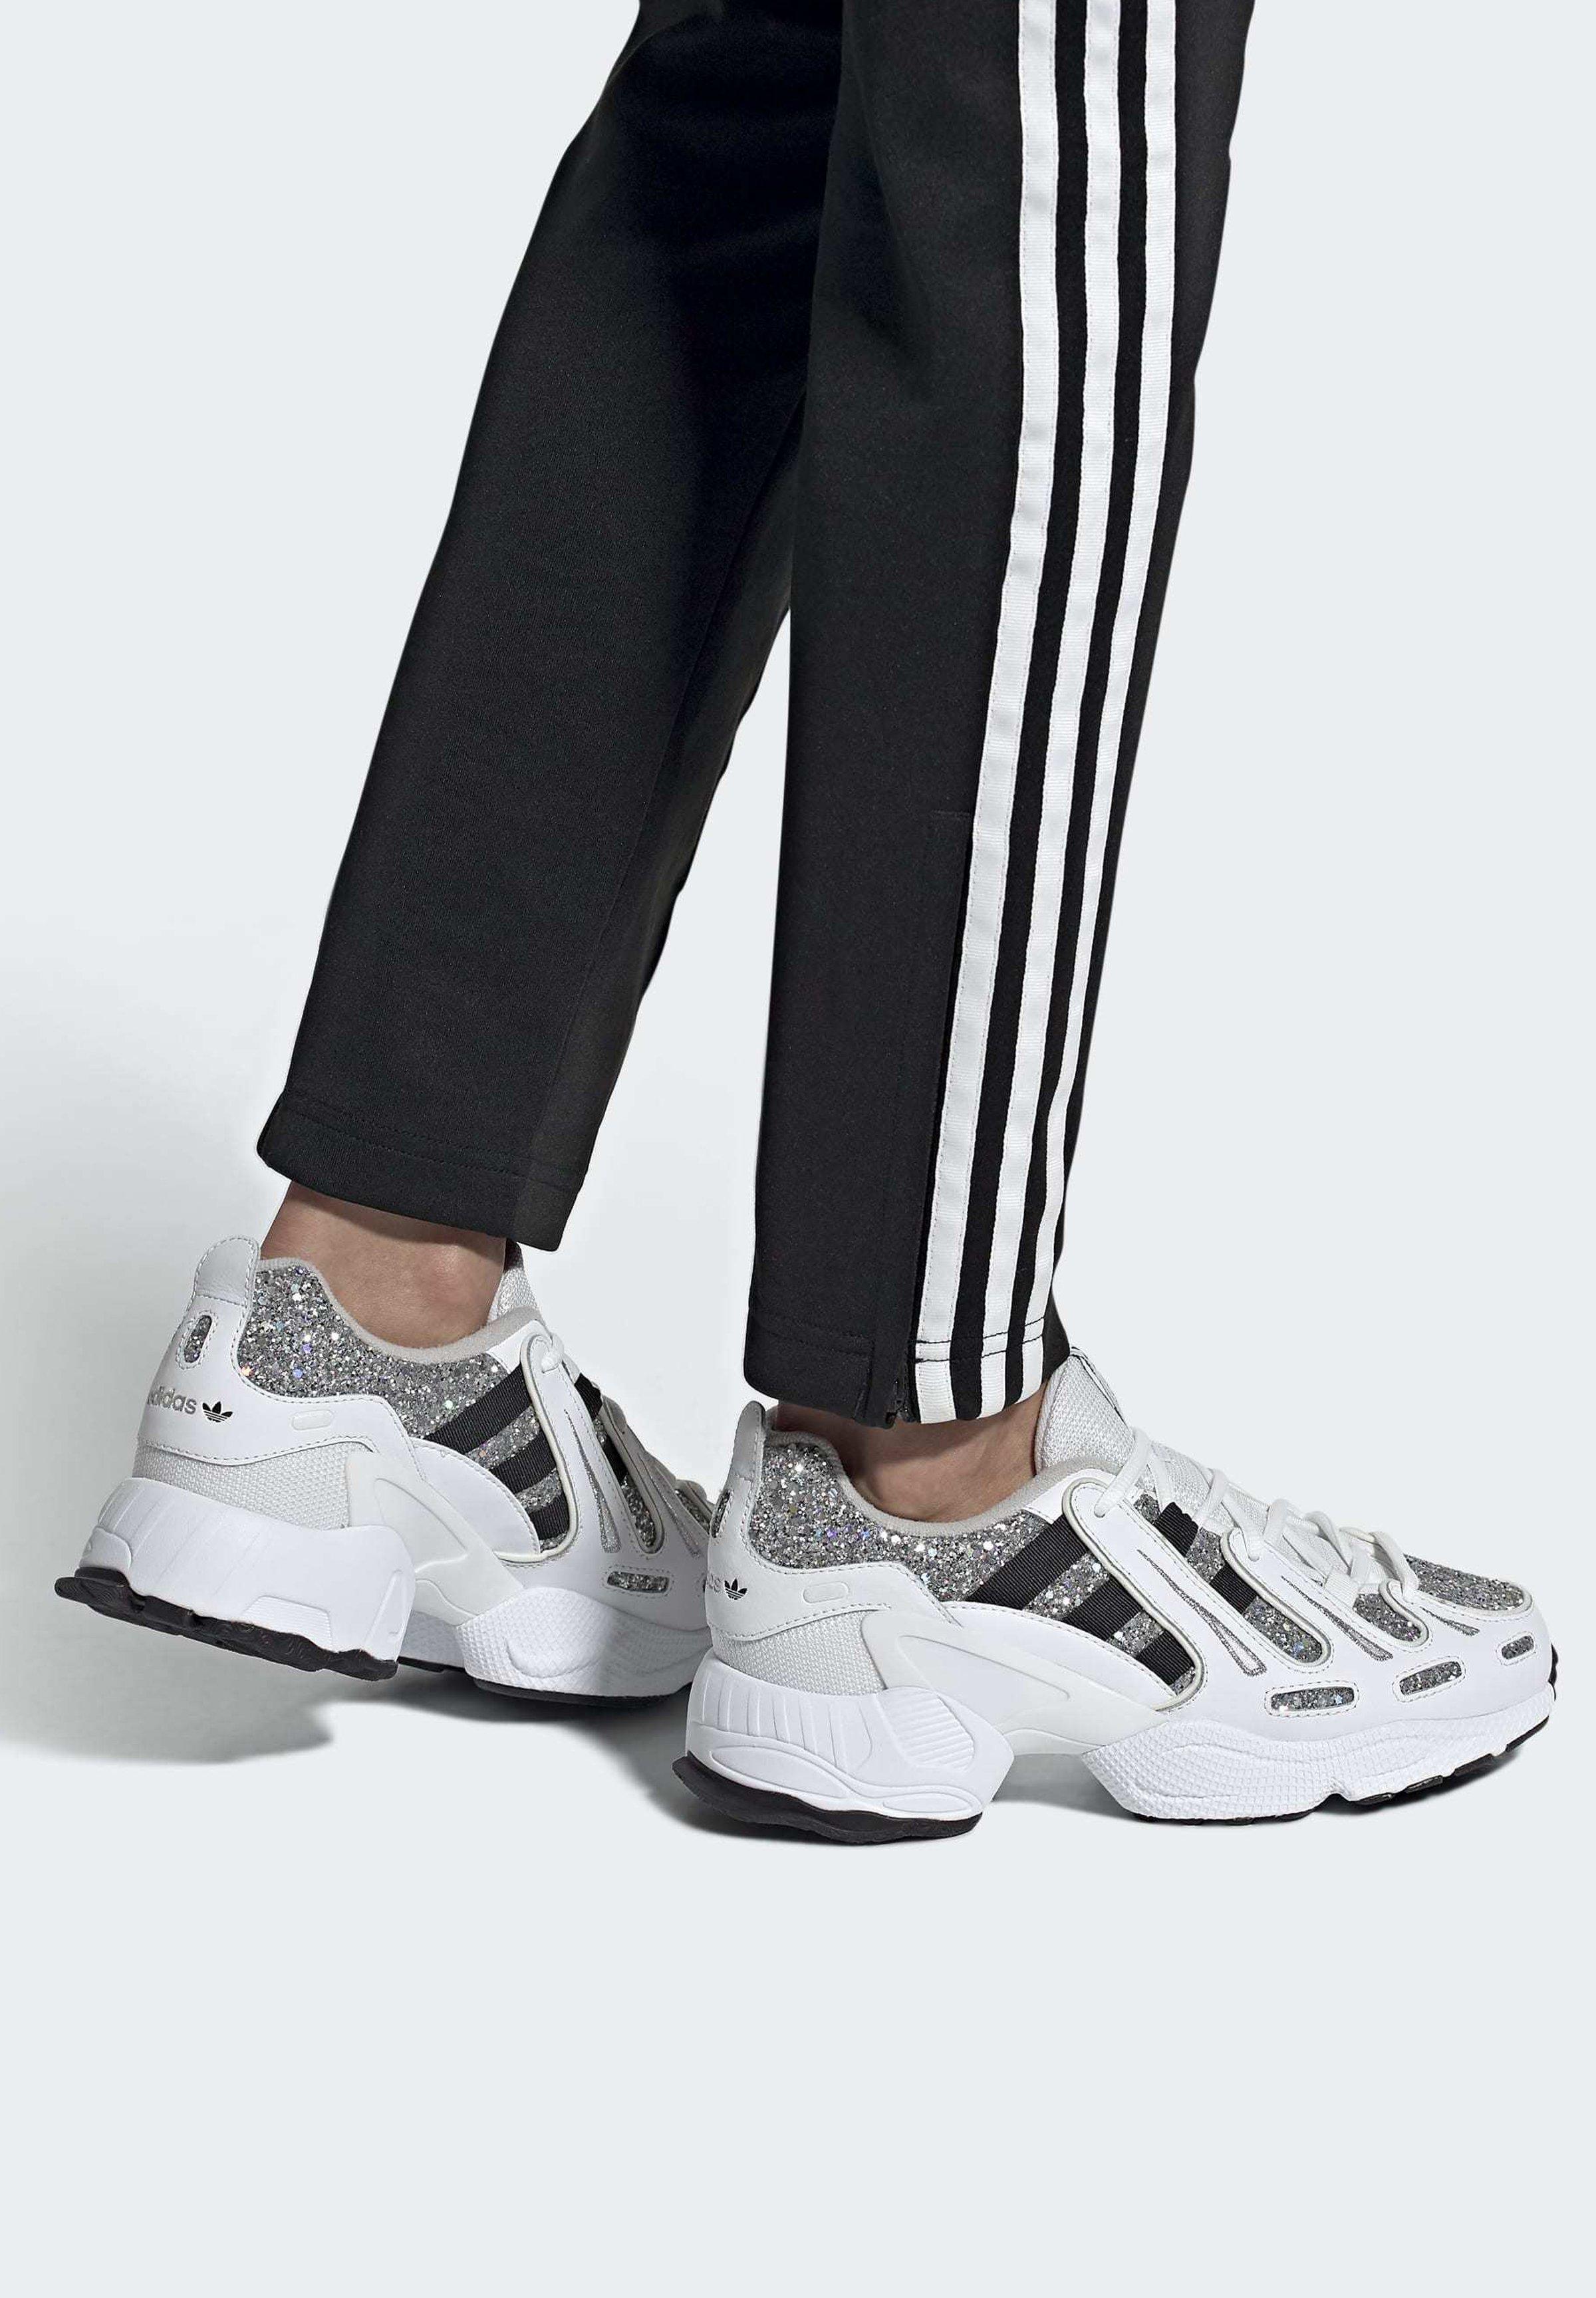 adidas originals YUNG 1 crystal whiteGREY ONE F17core